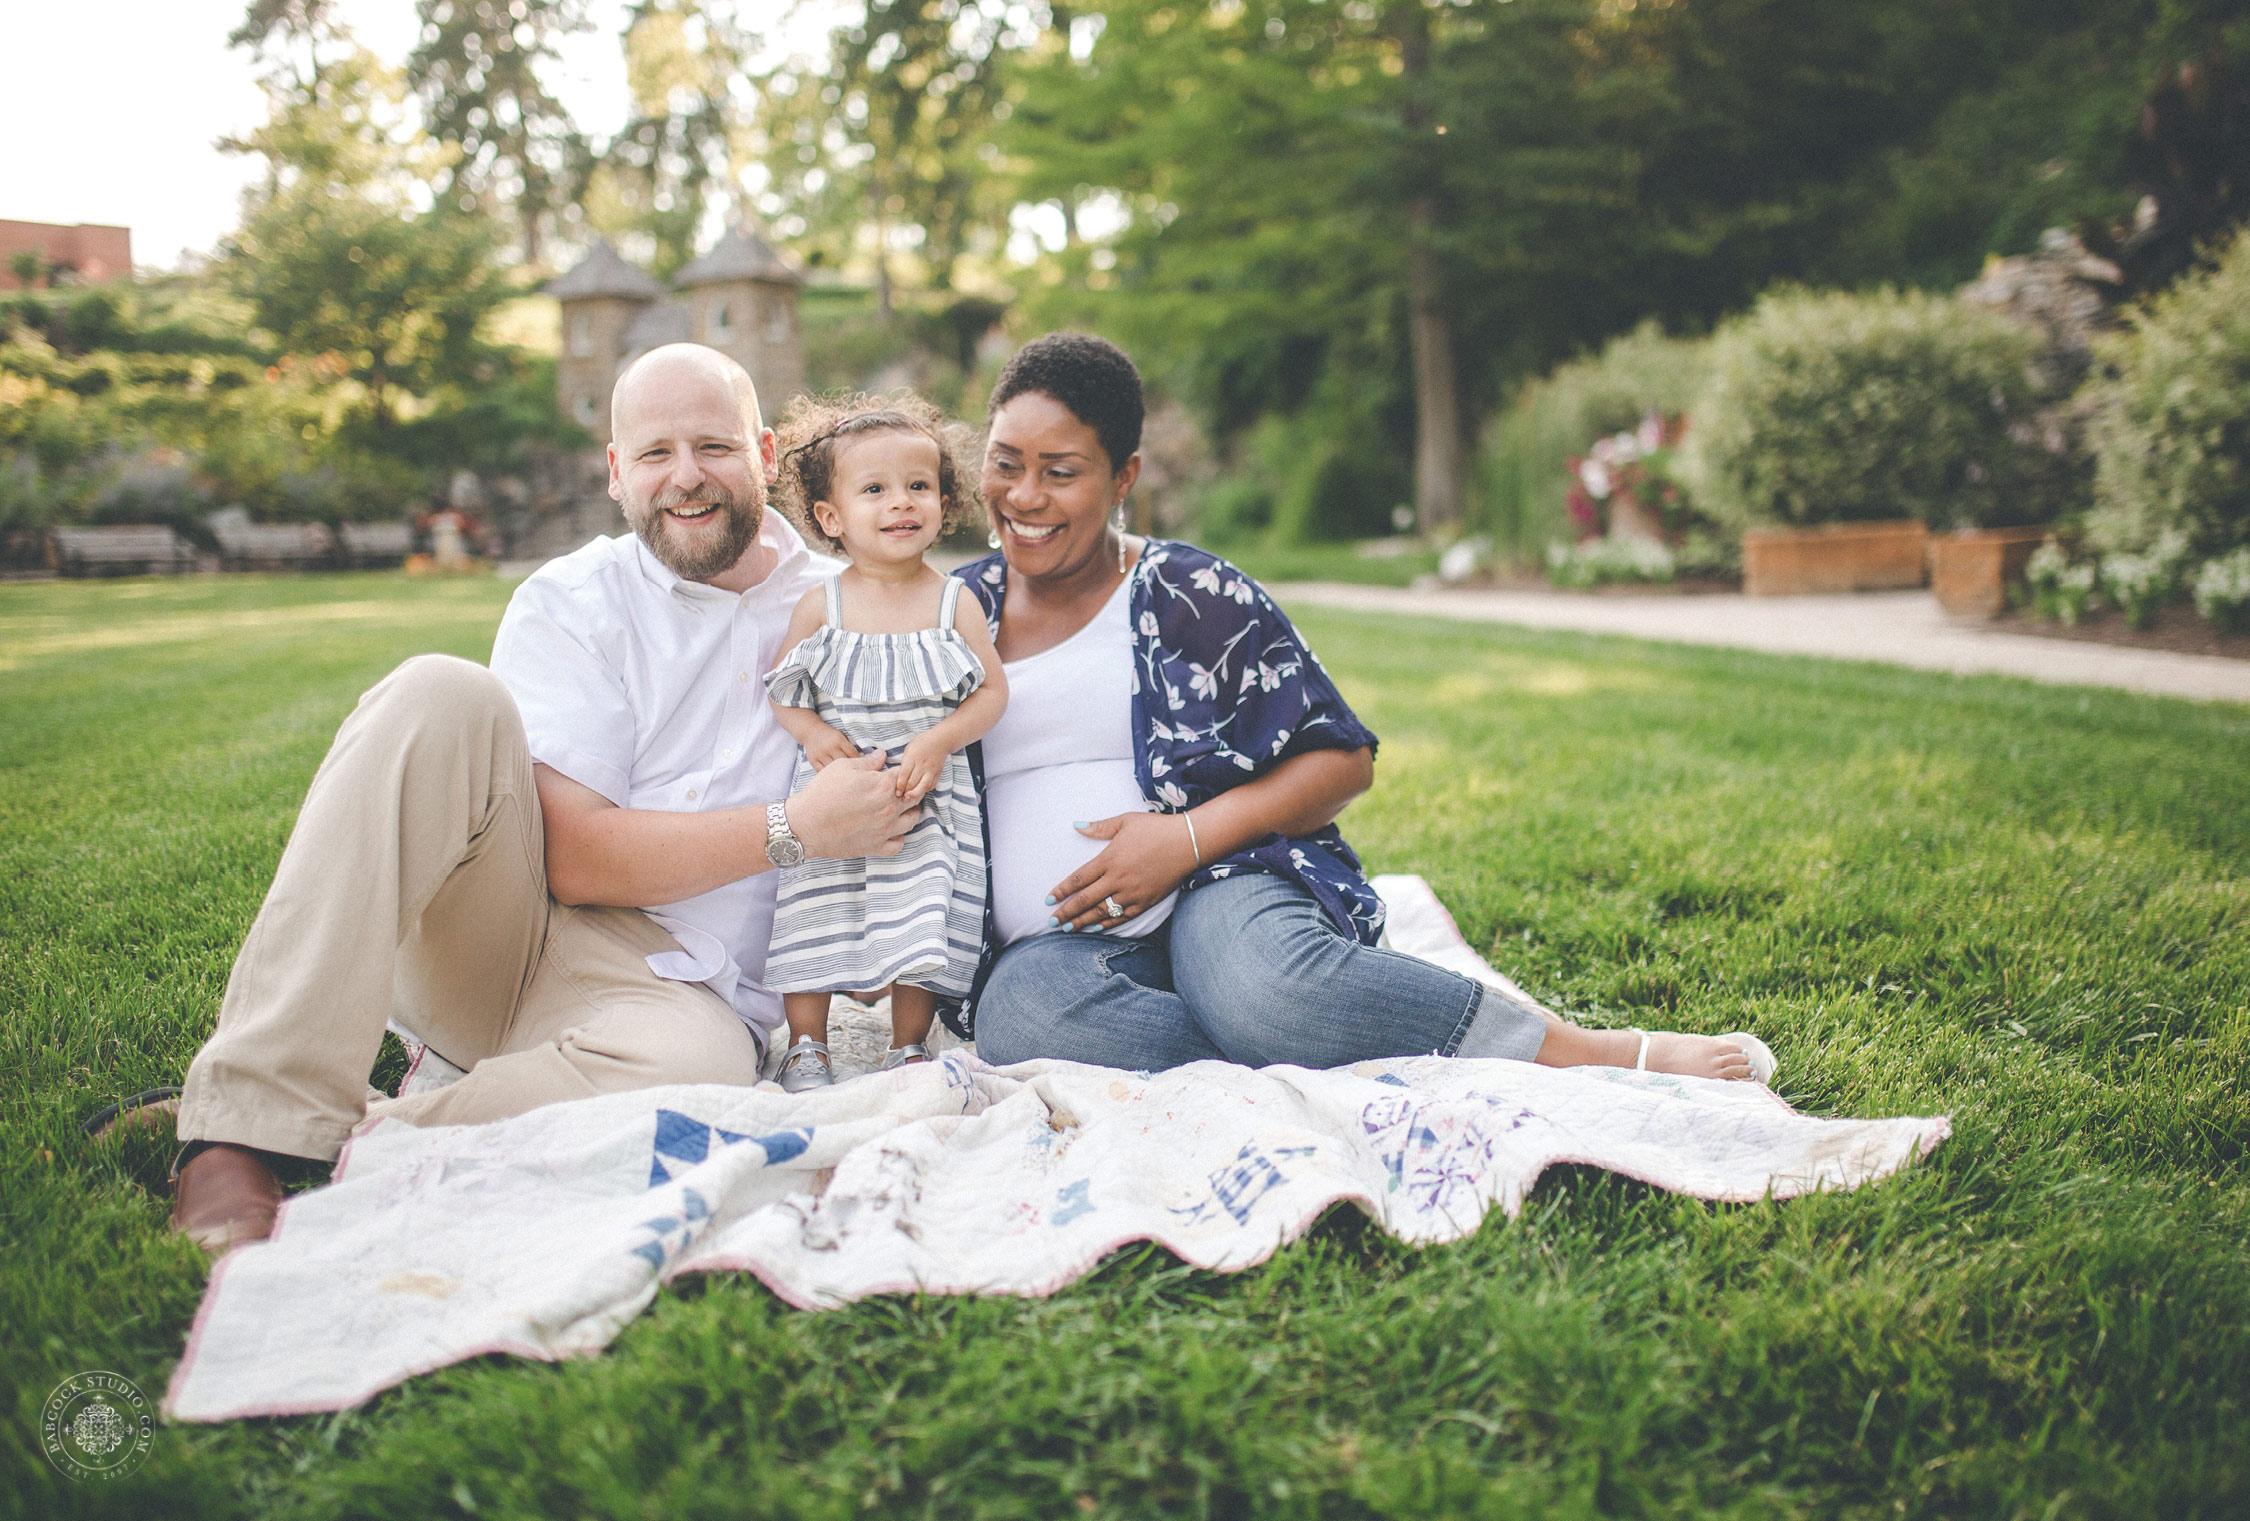 brande-langston-maternity-pregnancy-photographer-dayton-ohio-.jpg